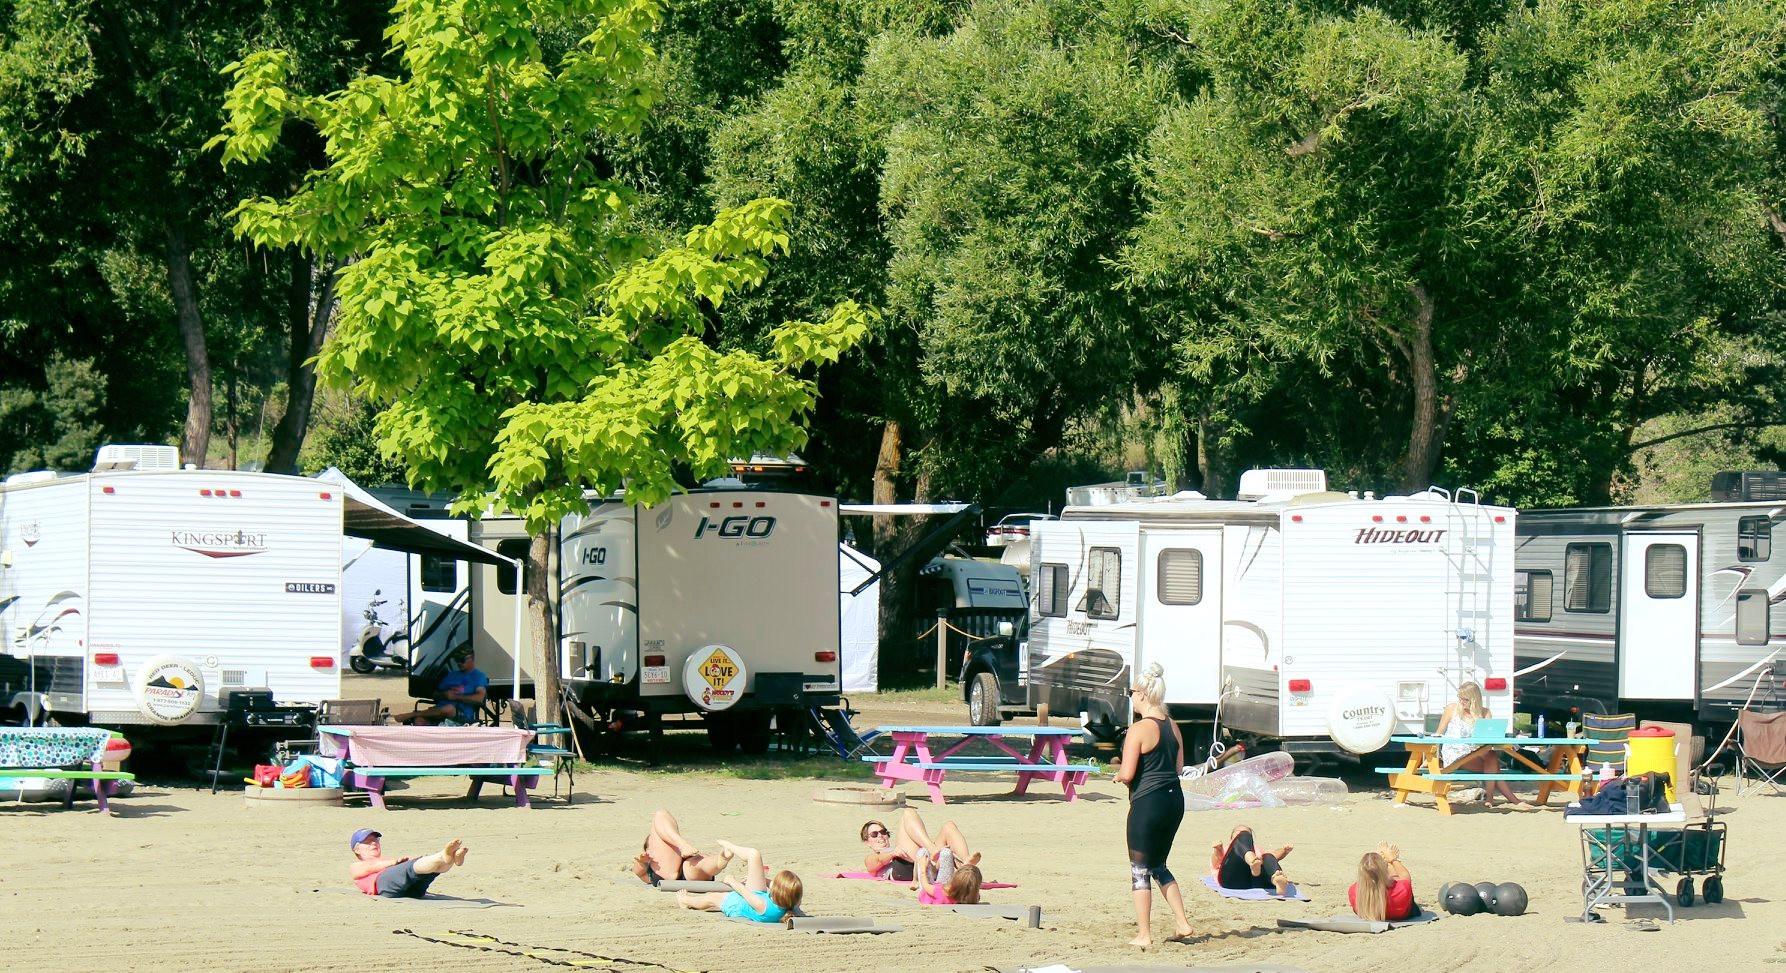 beach_Wood_Lake_RV_trailers_camping.jpg